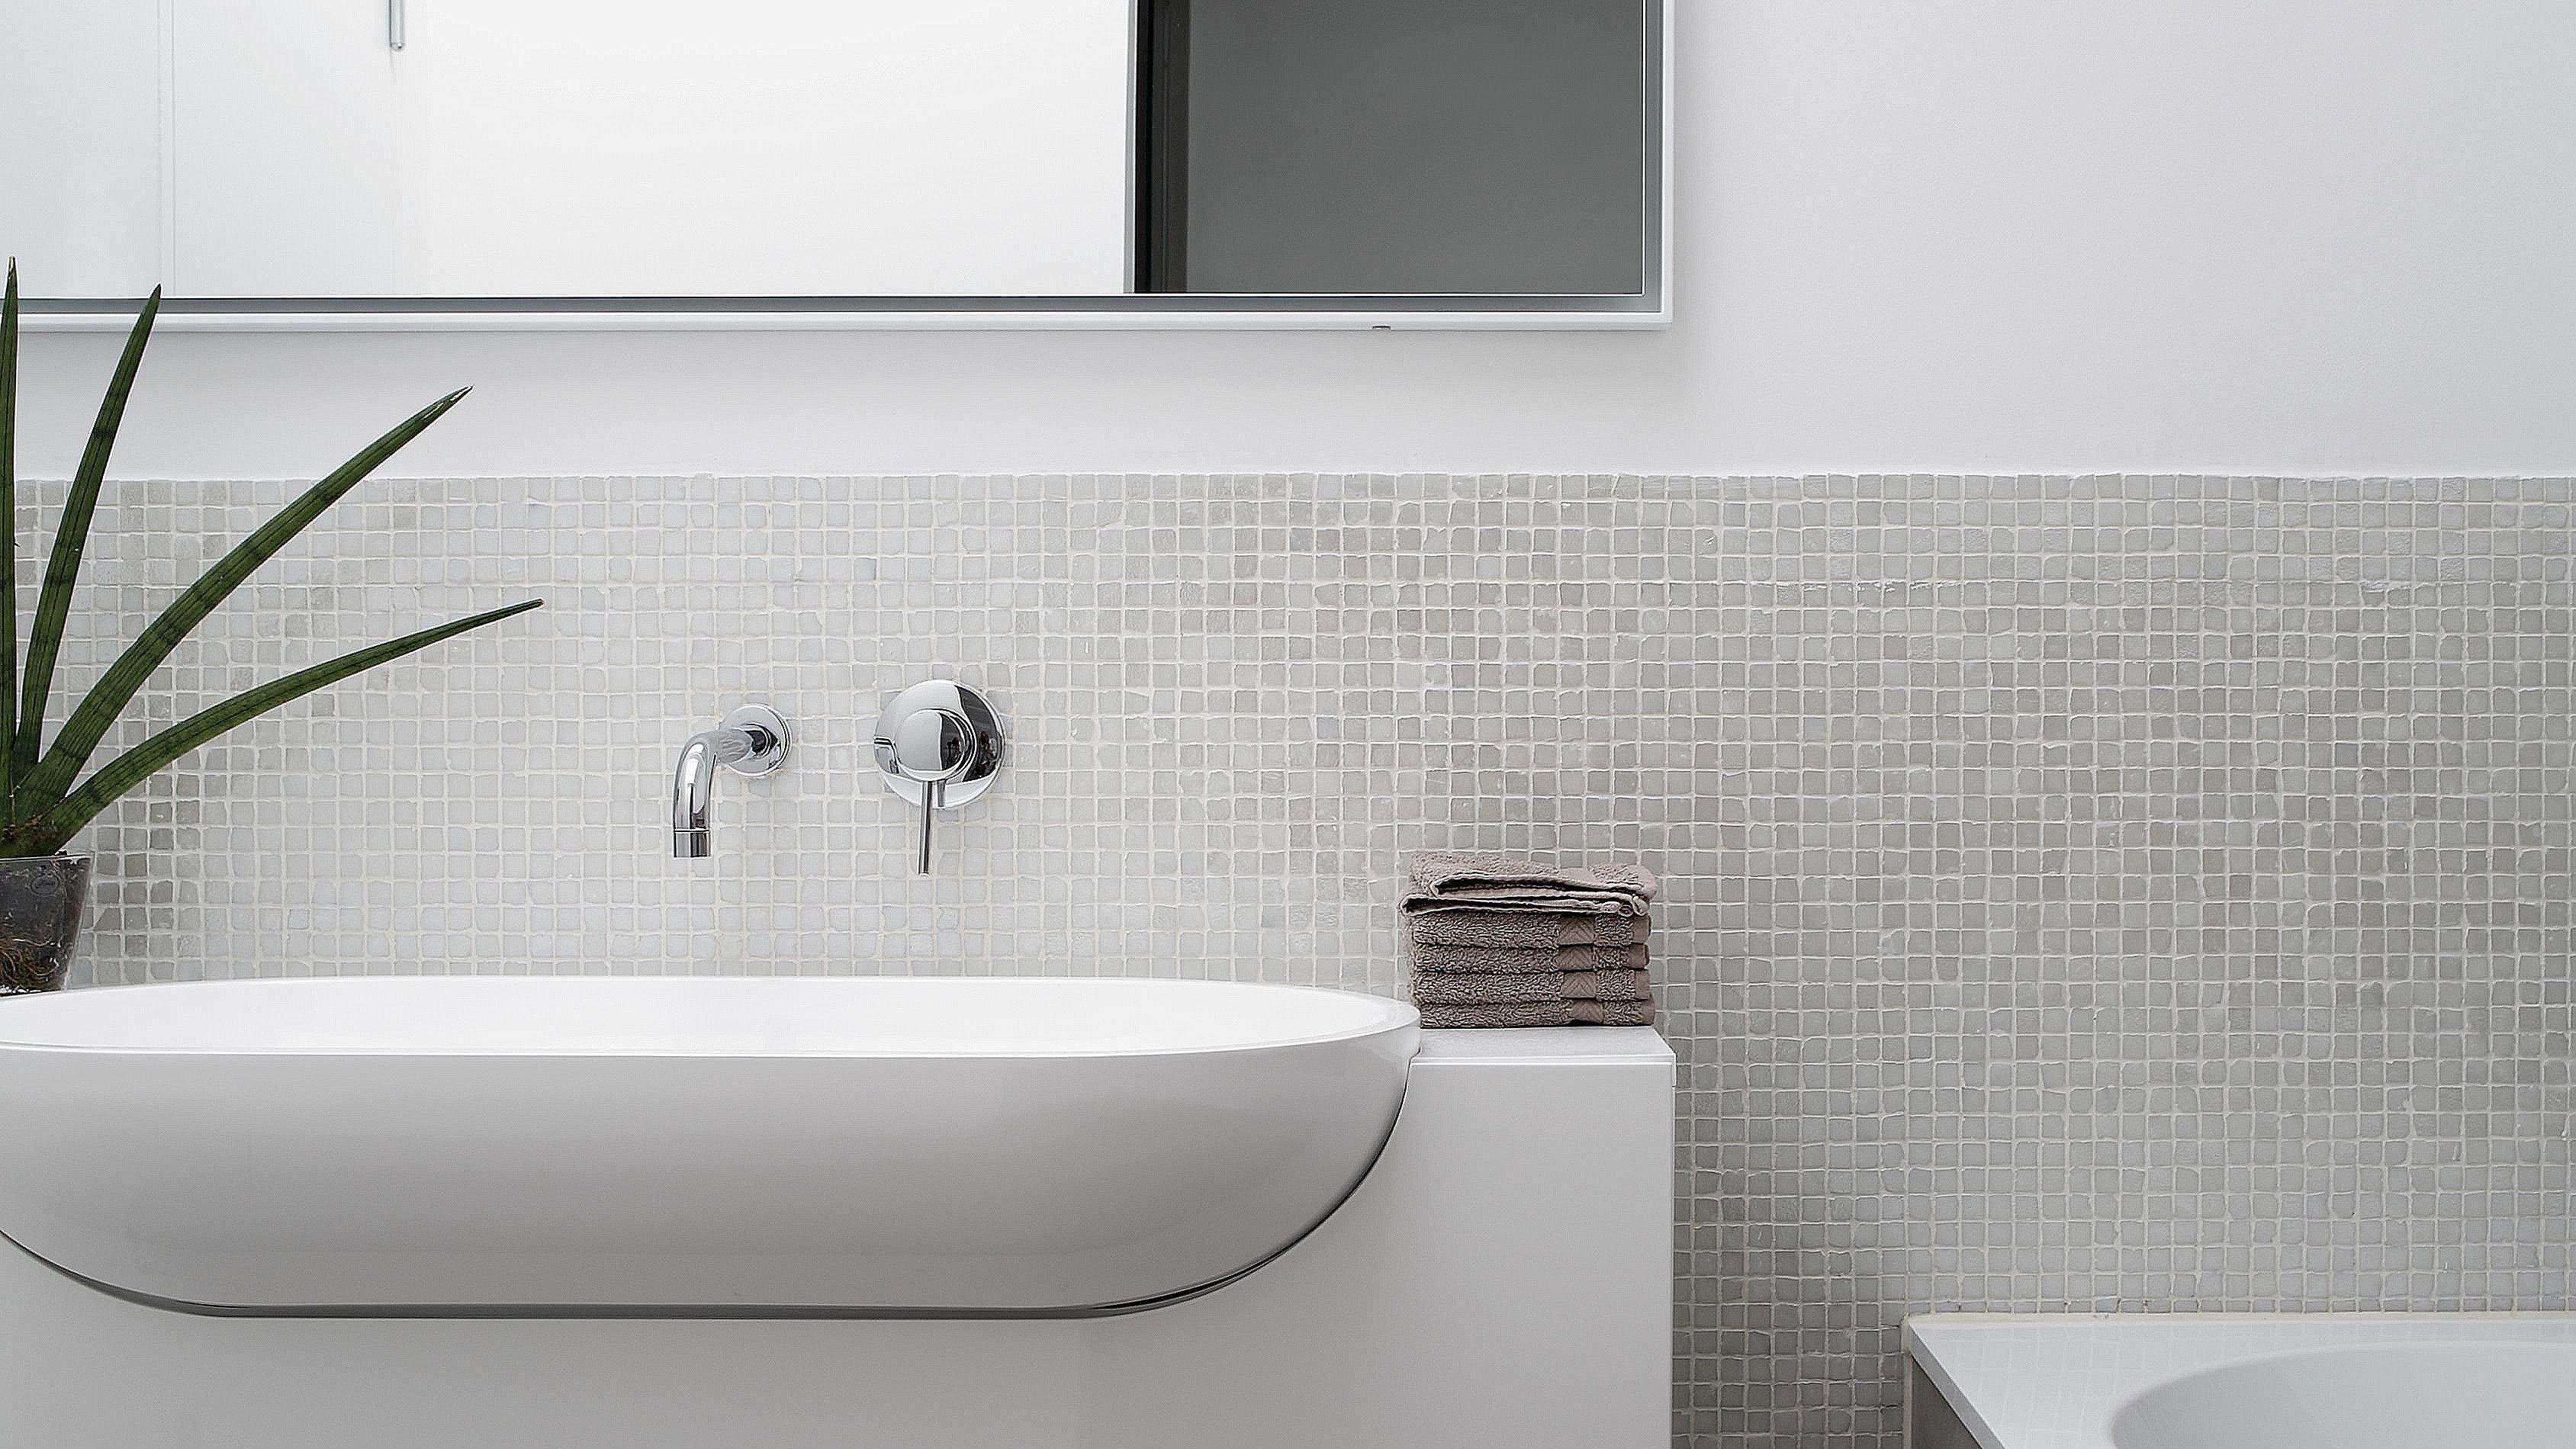 New Bathroom Design Showroom Bathroom Renovation Cost Bathroom Remodel Cost Beautiful Tile Bathroom